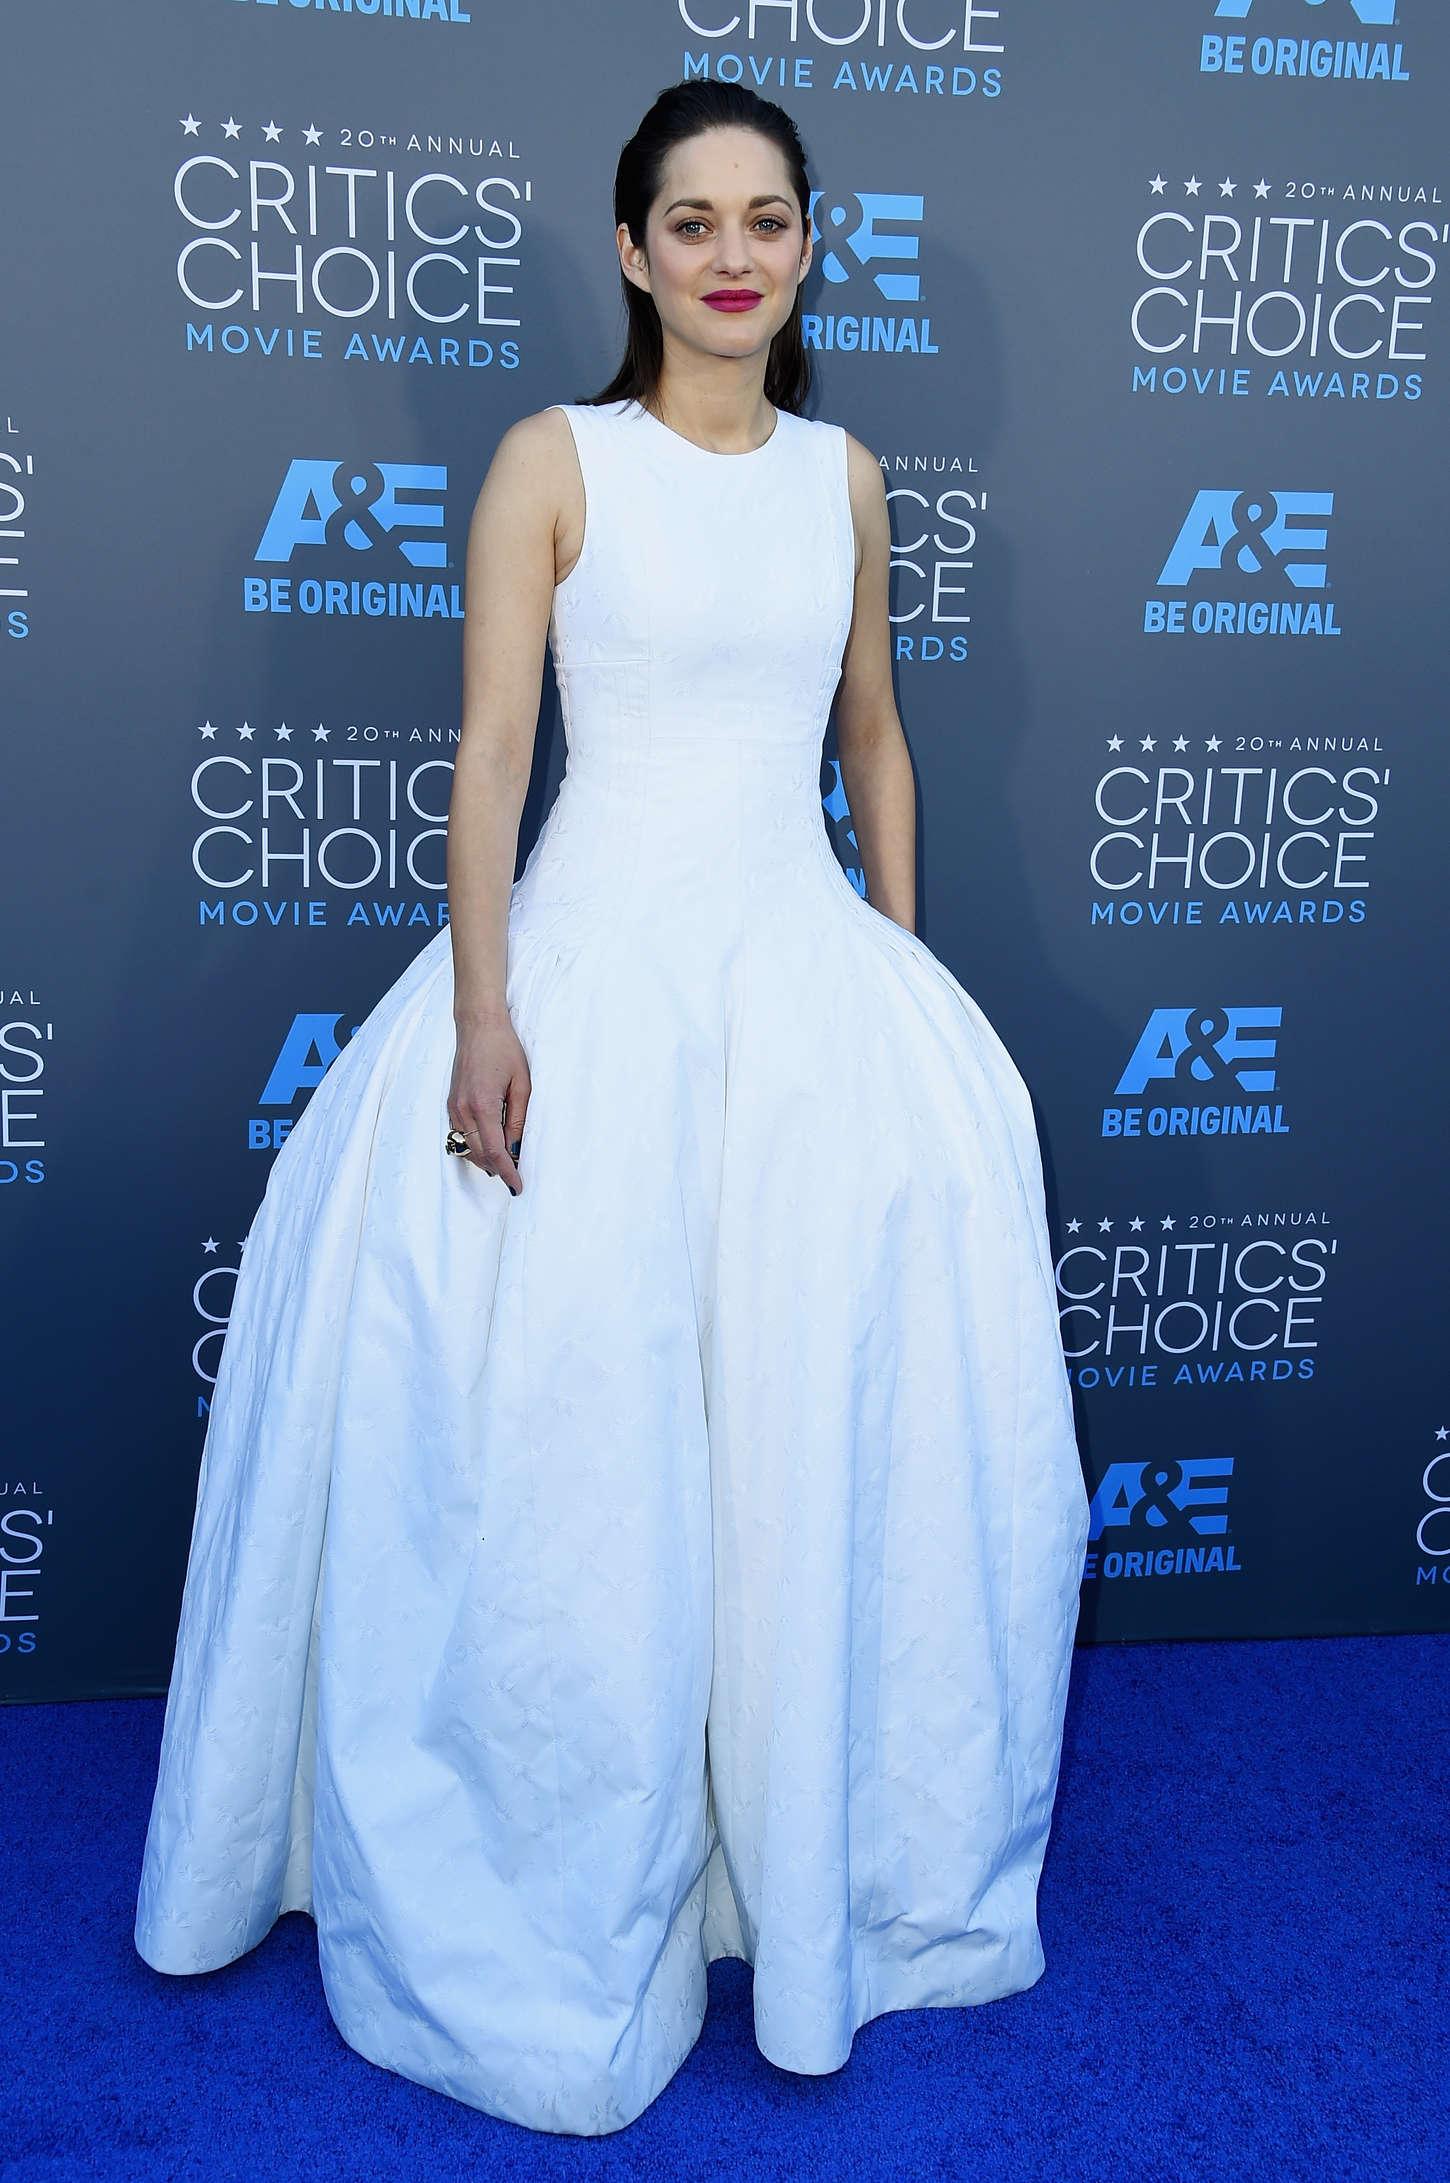 Marion Cotillard - 2015 Critics Choice Movie Awards in LA